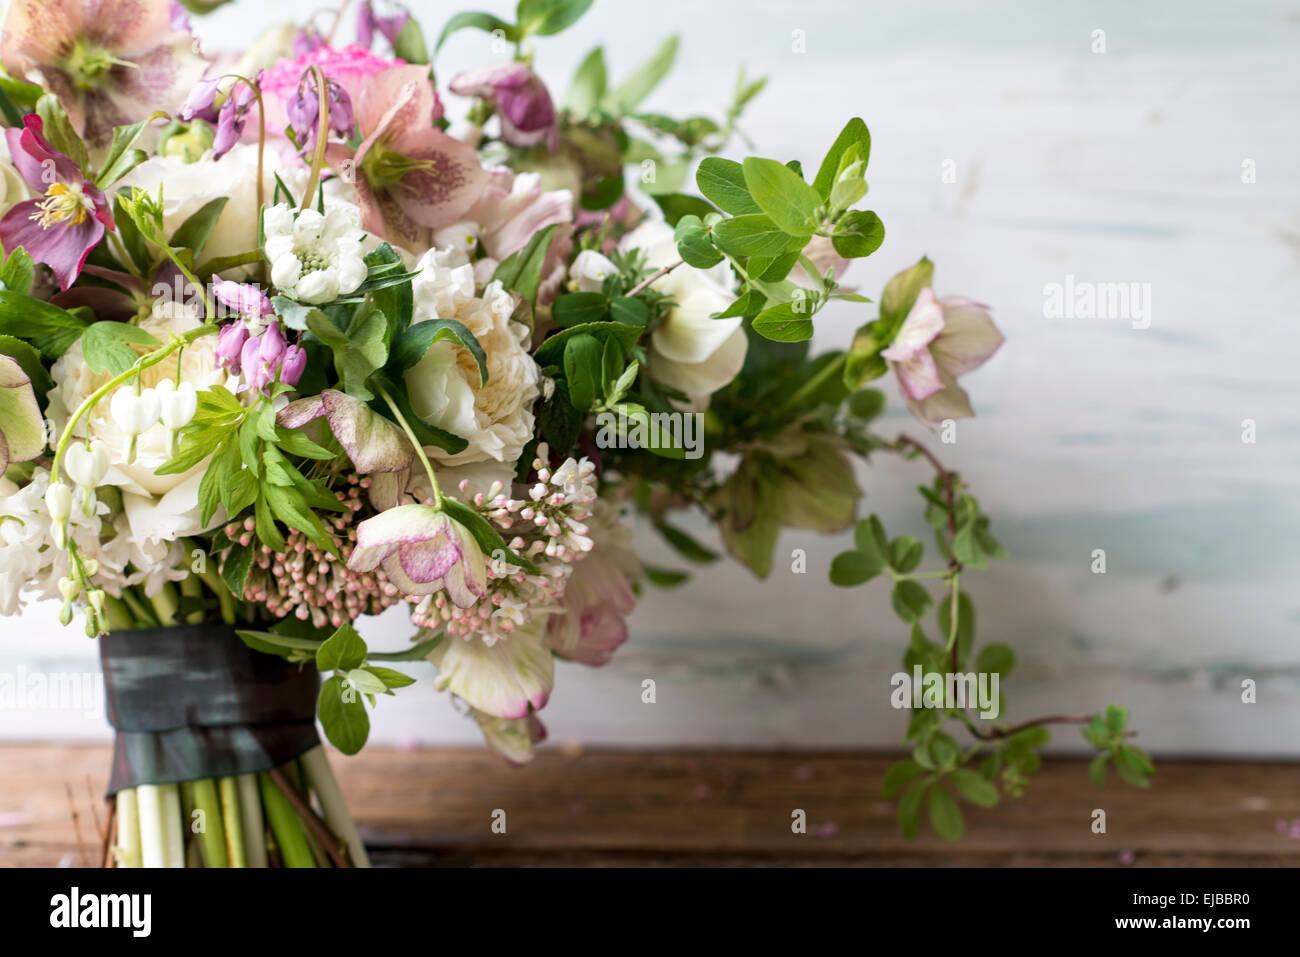 Blumengesteck Stockfotos & Blumengesteck Bilder